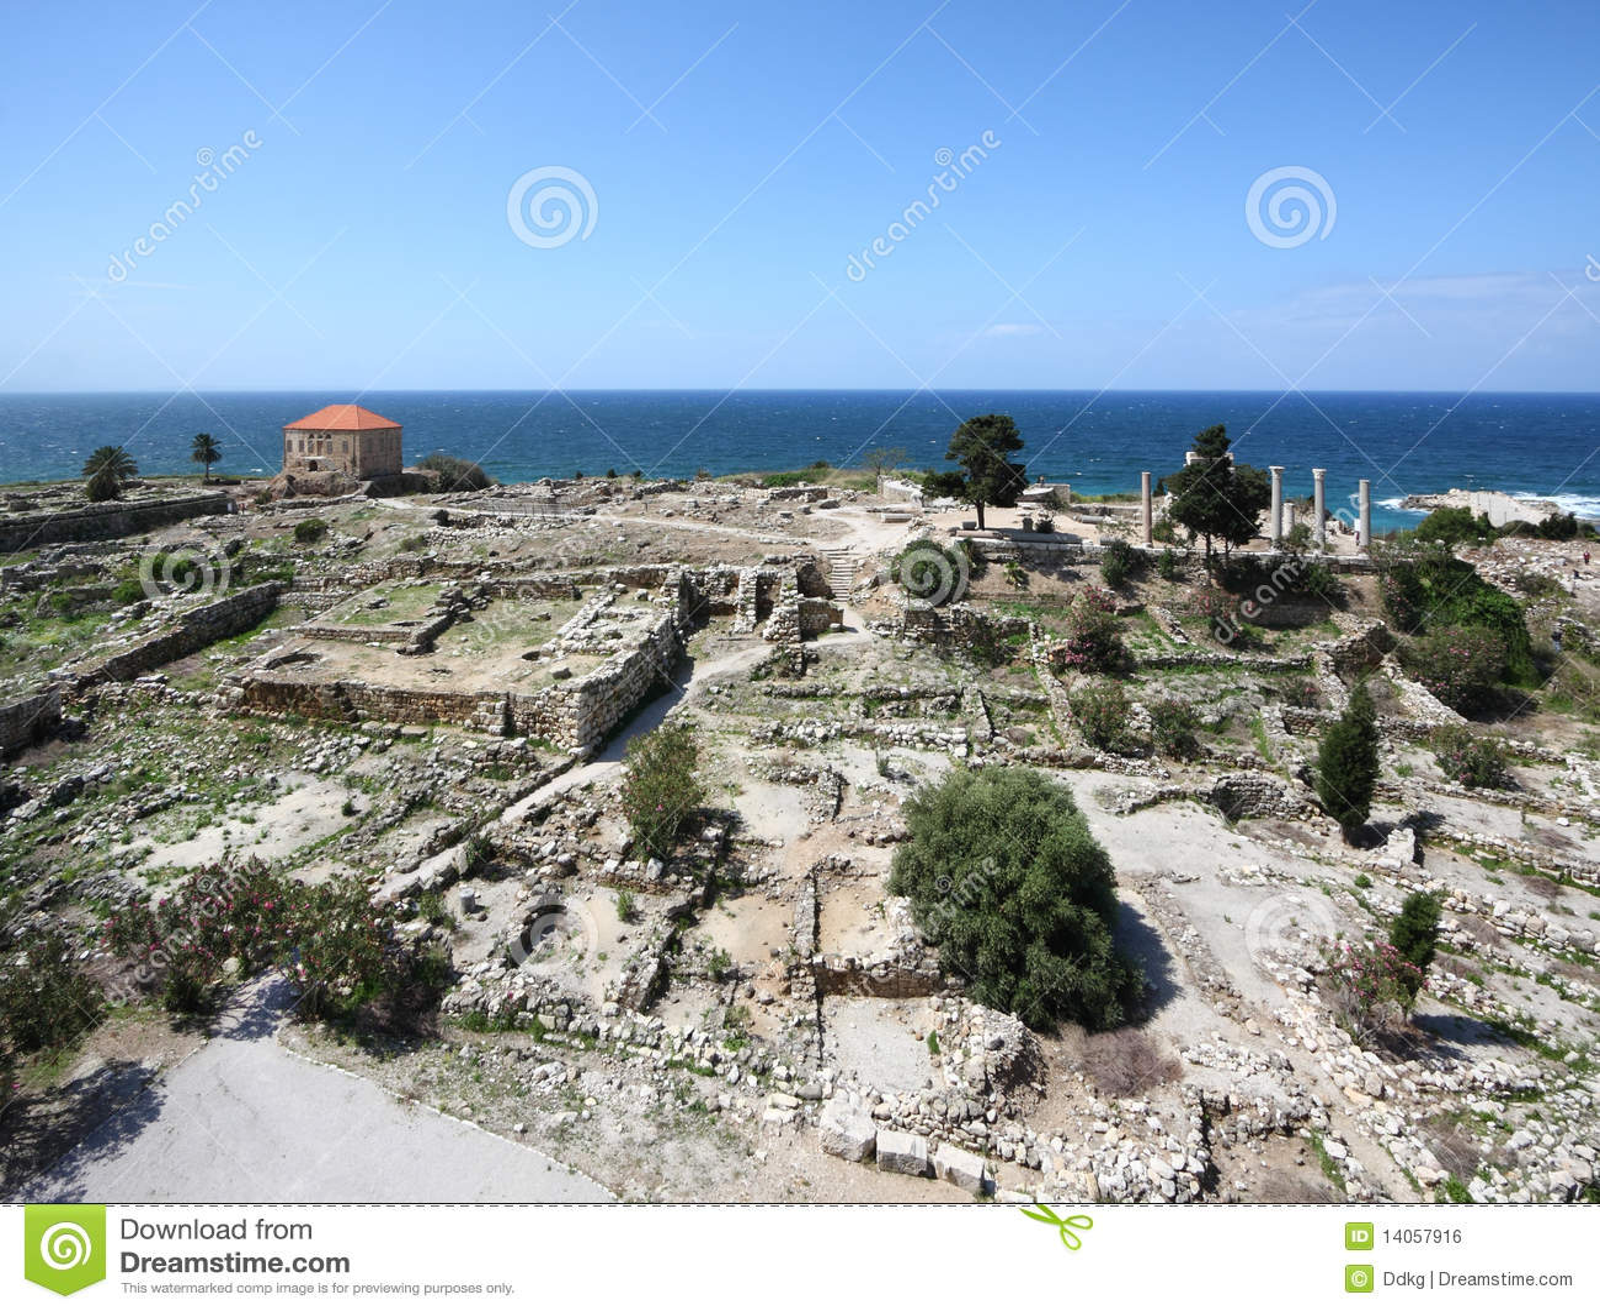 Byblos Archeological Site, Lebanon